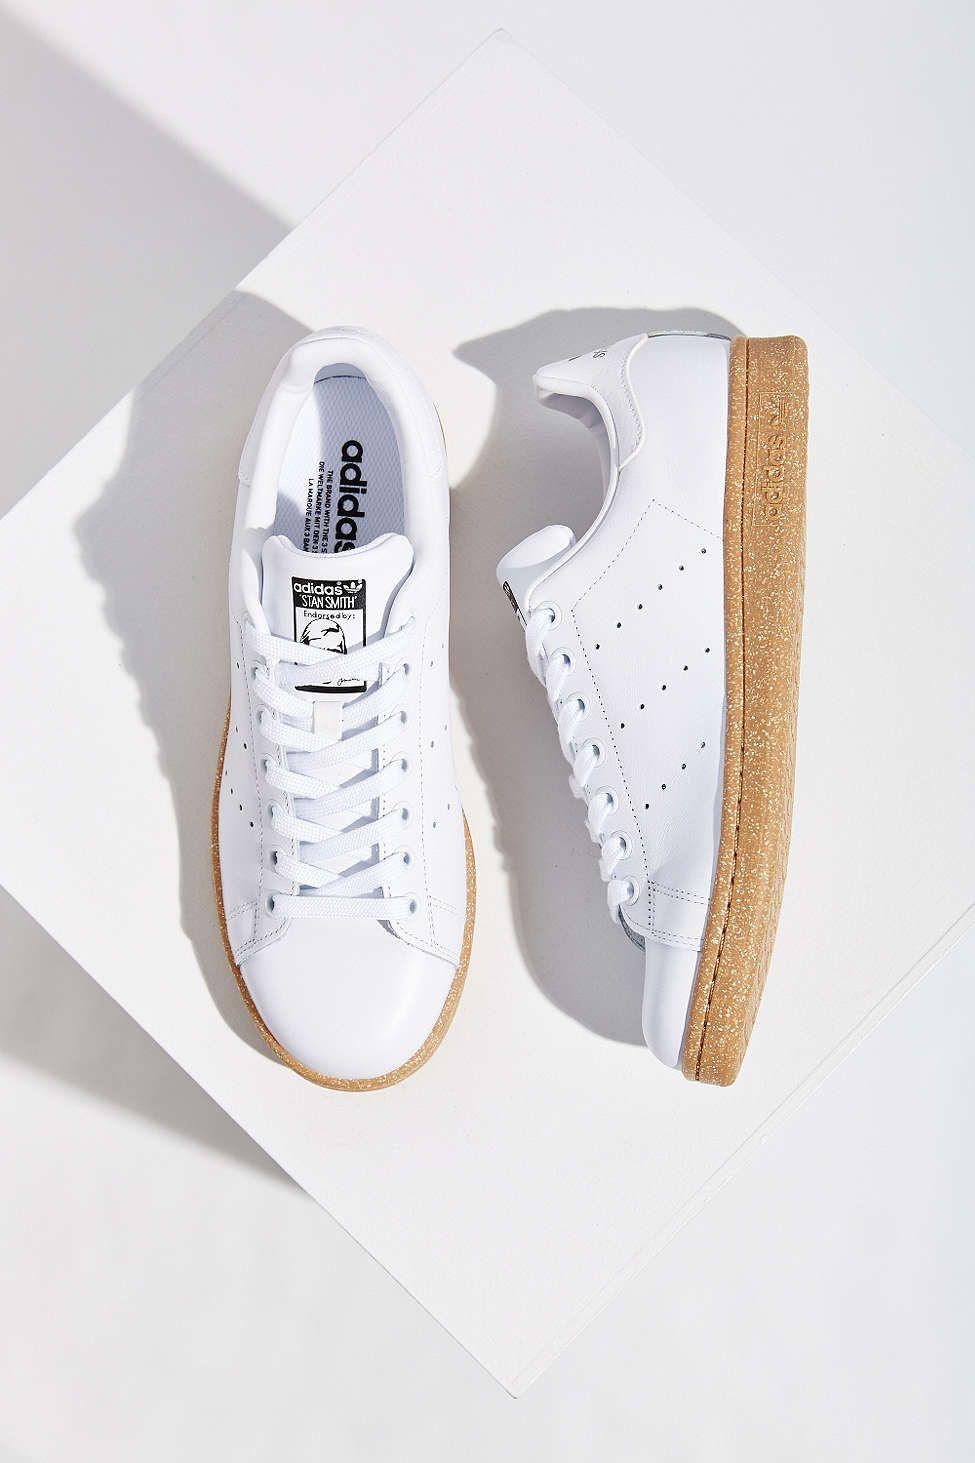 adidas / stan smith / gum-sole sneaker                                                                                                                                                      もっと見る